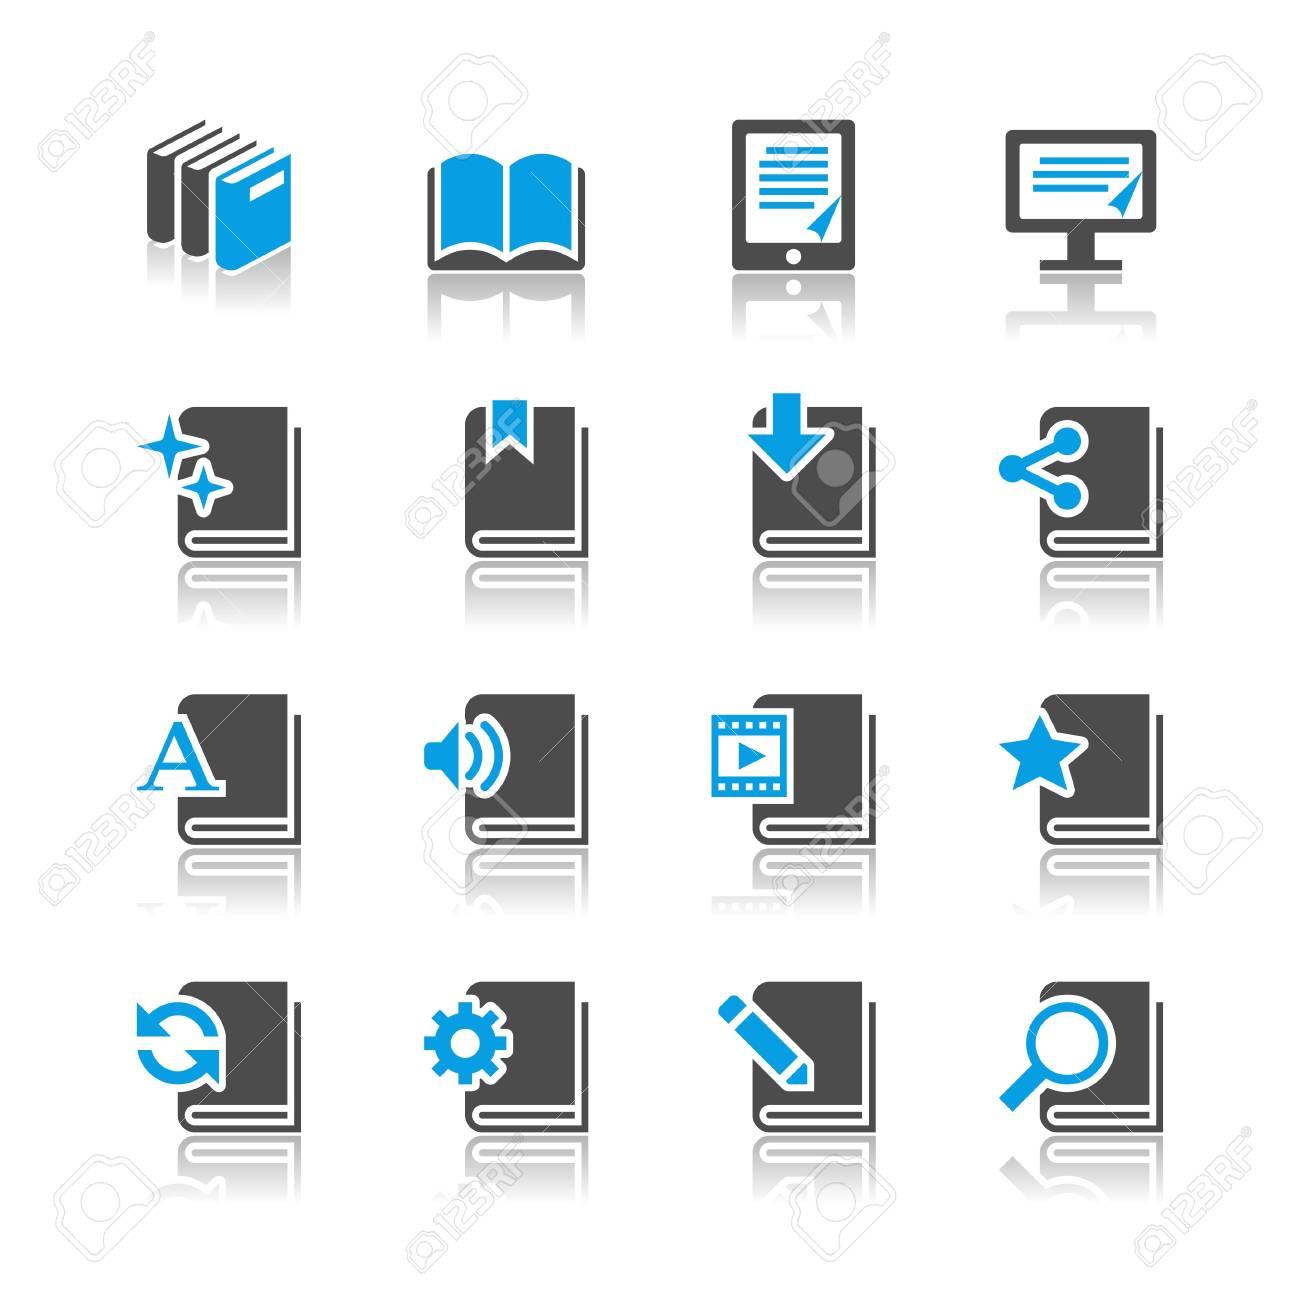 Book icons - reflection theme Stock Vector - 18915401